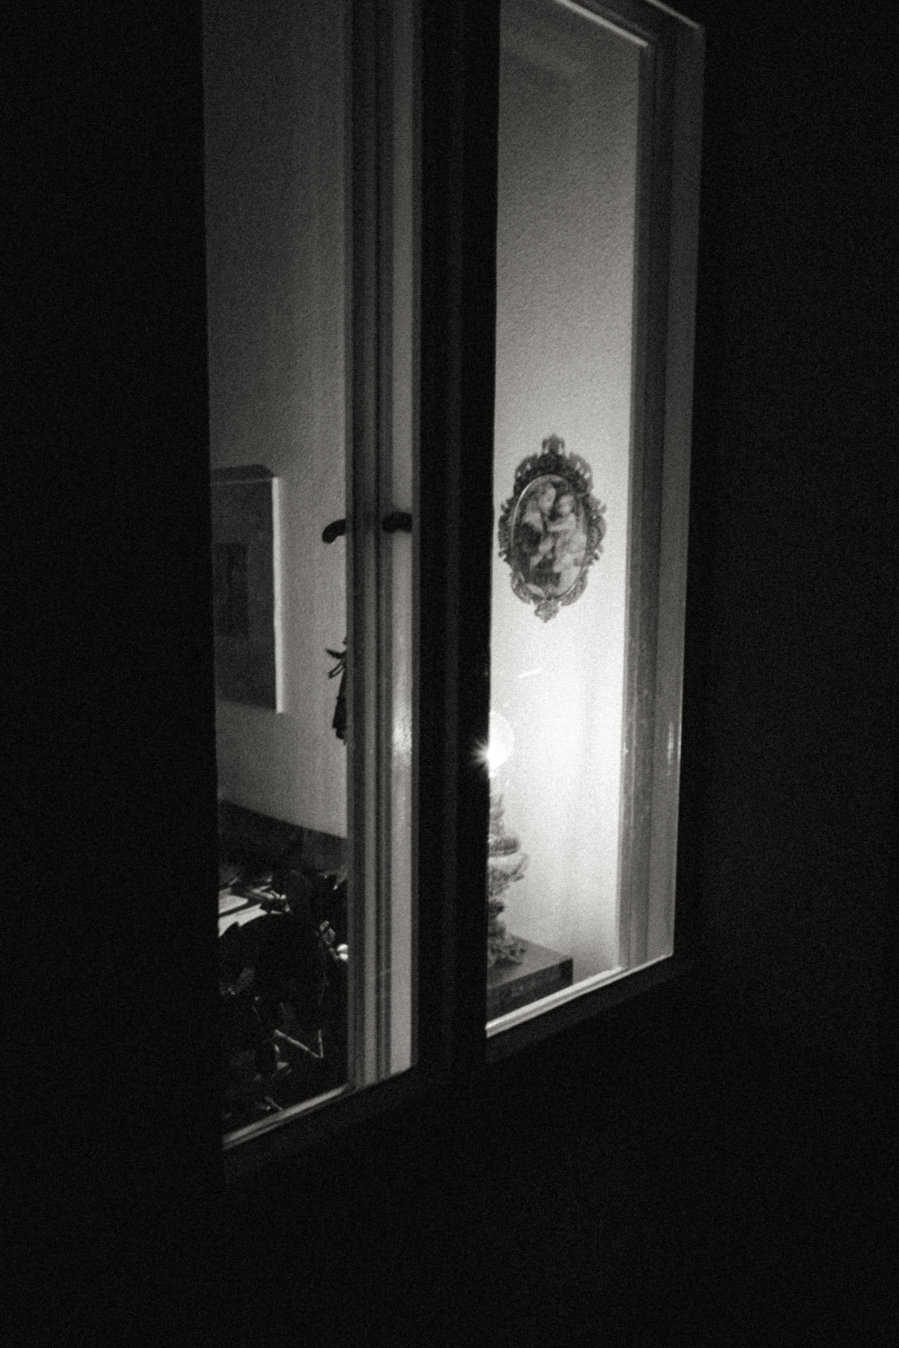 © Holger Kral • Photography - Last American Spirits - Berlin, Cityscape, Fujifilm X70, On my Doorstep - photo #36